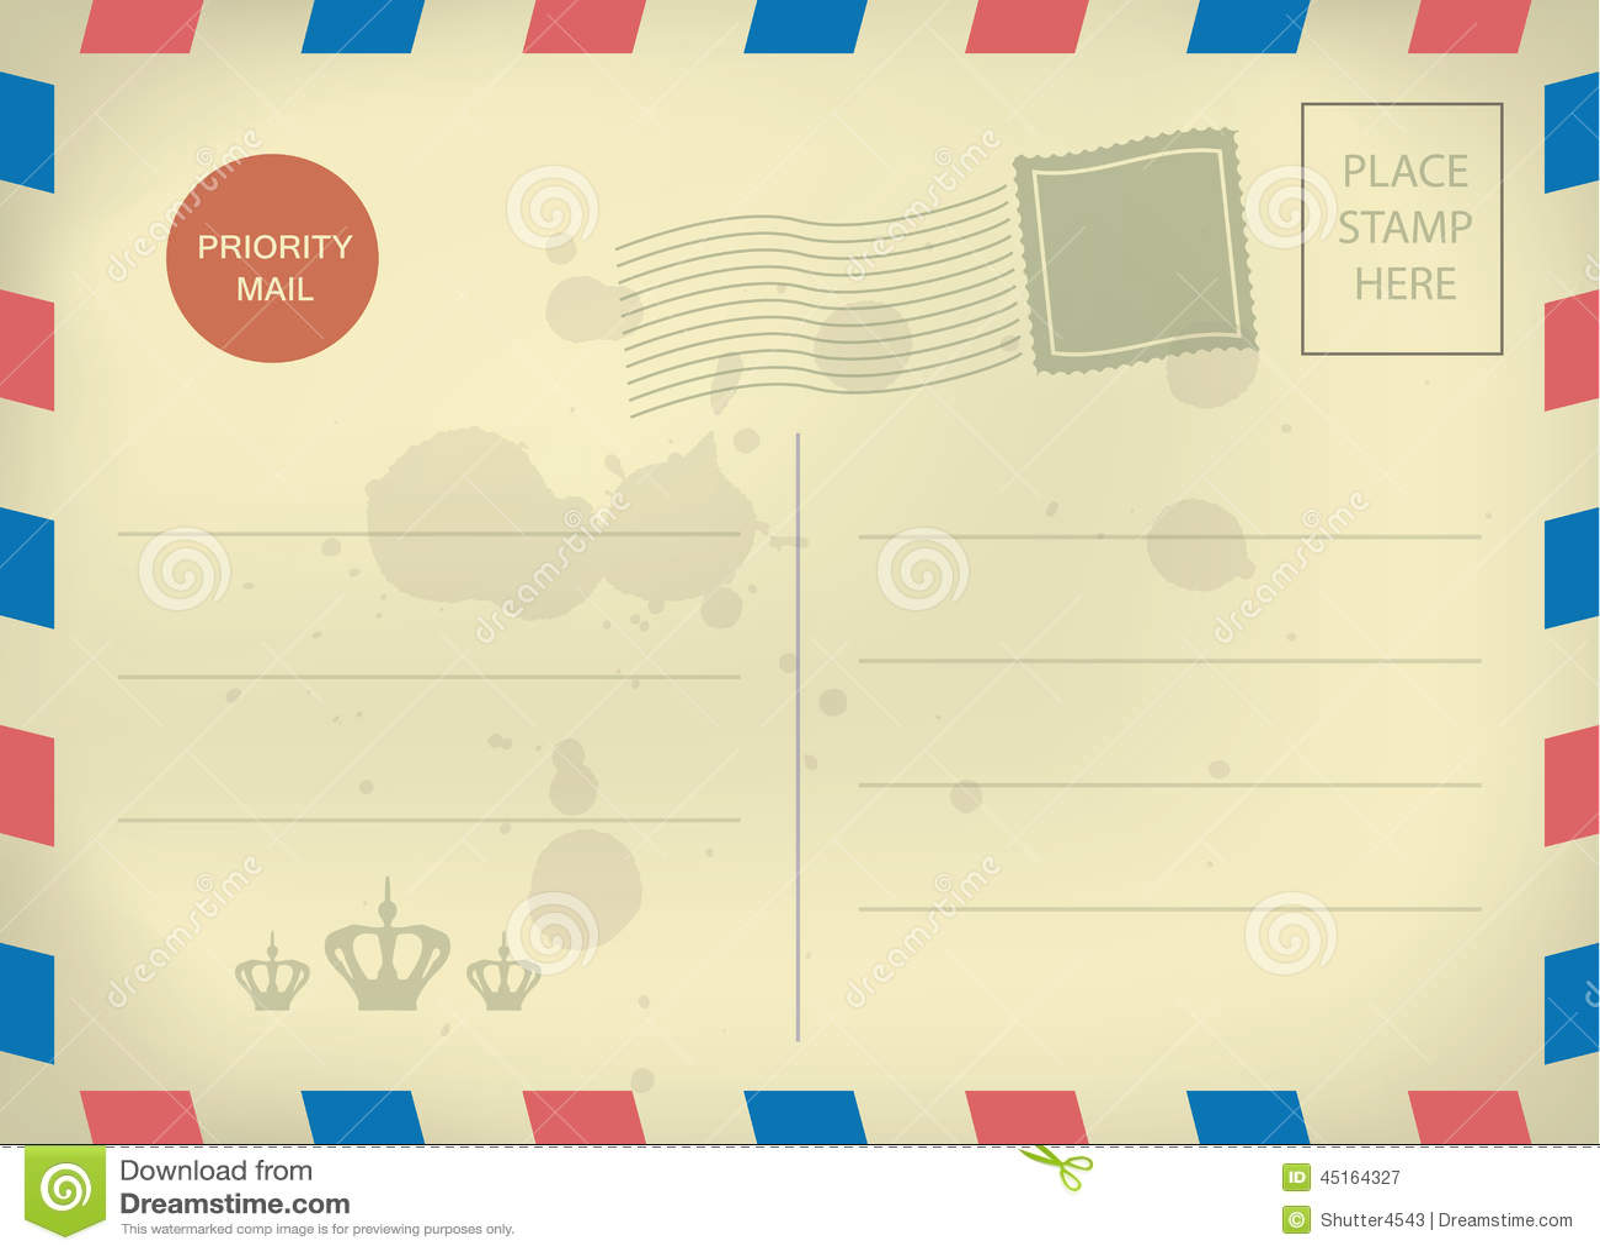 Vintage Blank Postcard Template Stock Vector